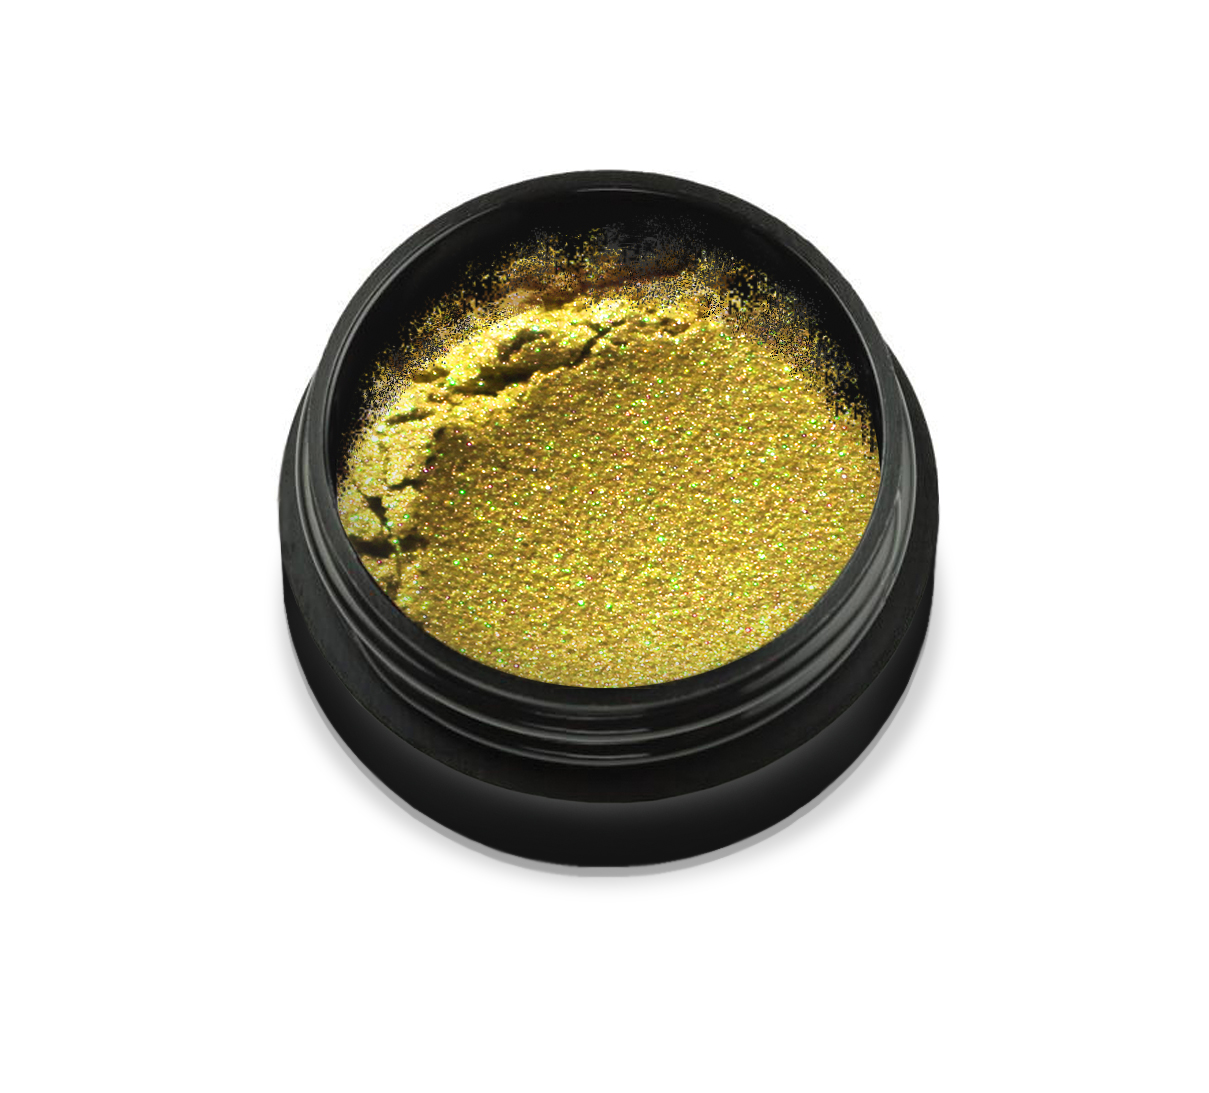 "6113 Pudra cu pigmenti 'Didier Lab"", magic yellow, 2,5g/Pigment powder 'Didier Lab"", magic yellow"